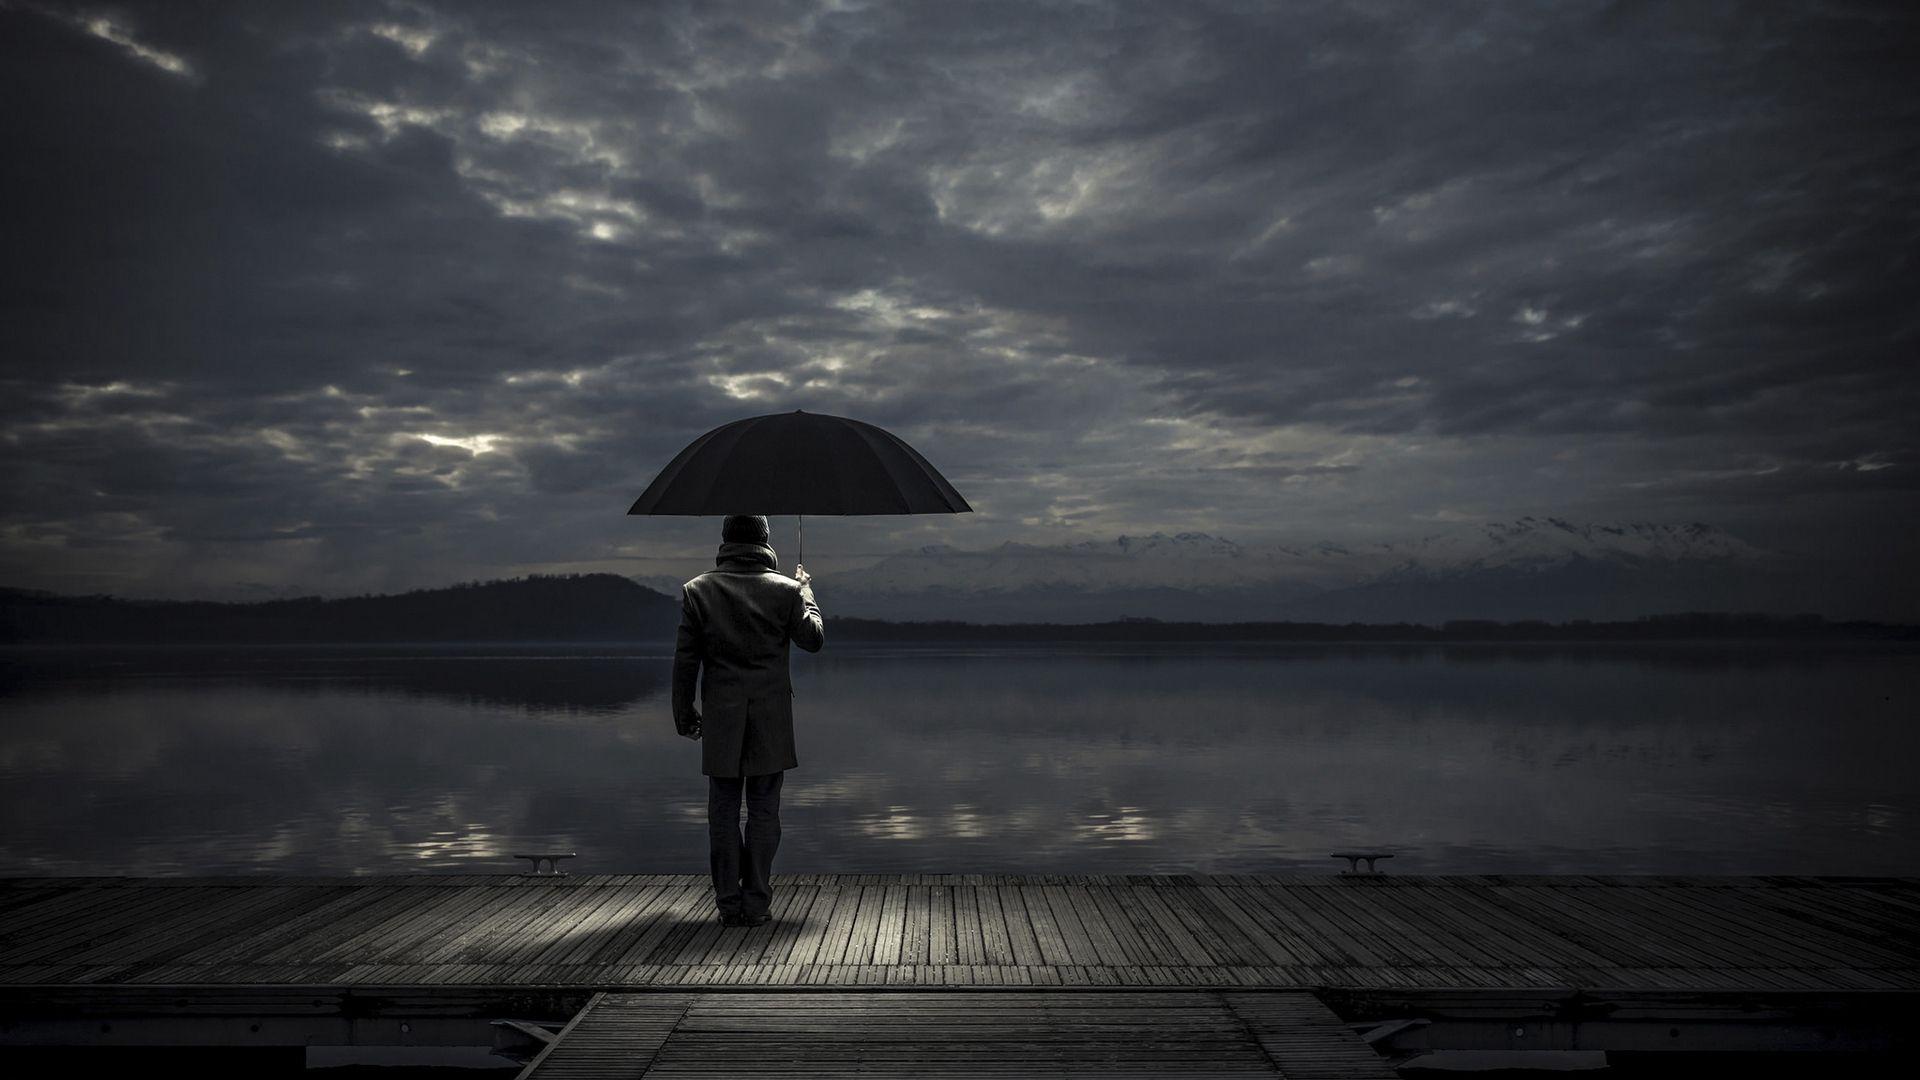 Download Man, Umbrella, Night, Pier Wallpaper, Background Full Hd